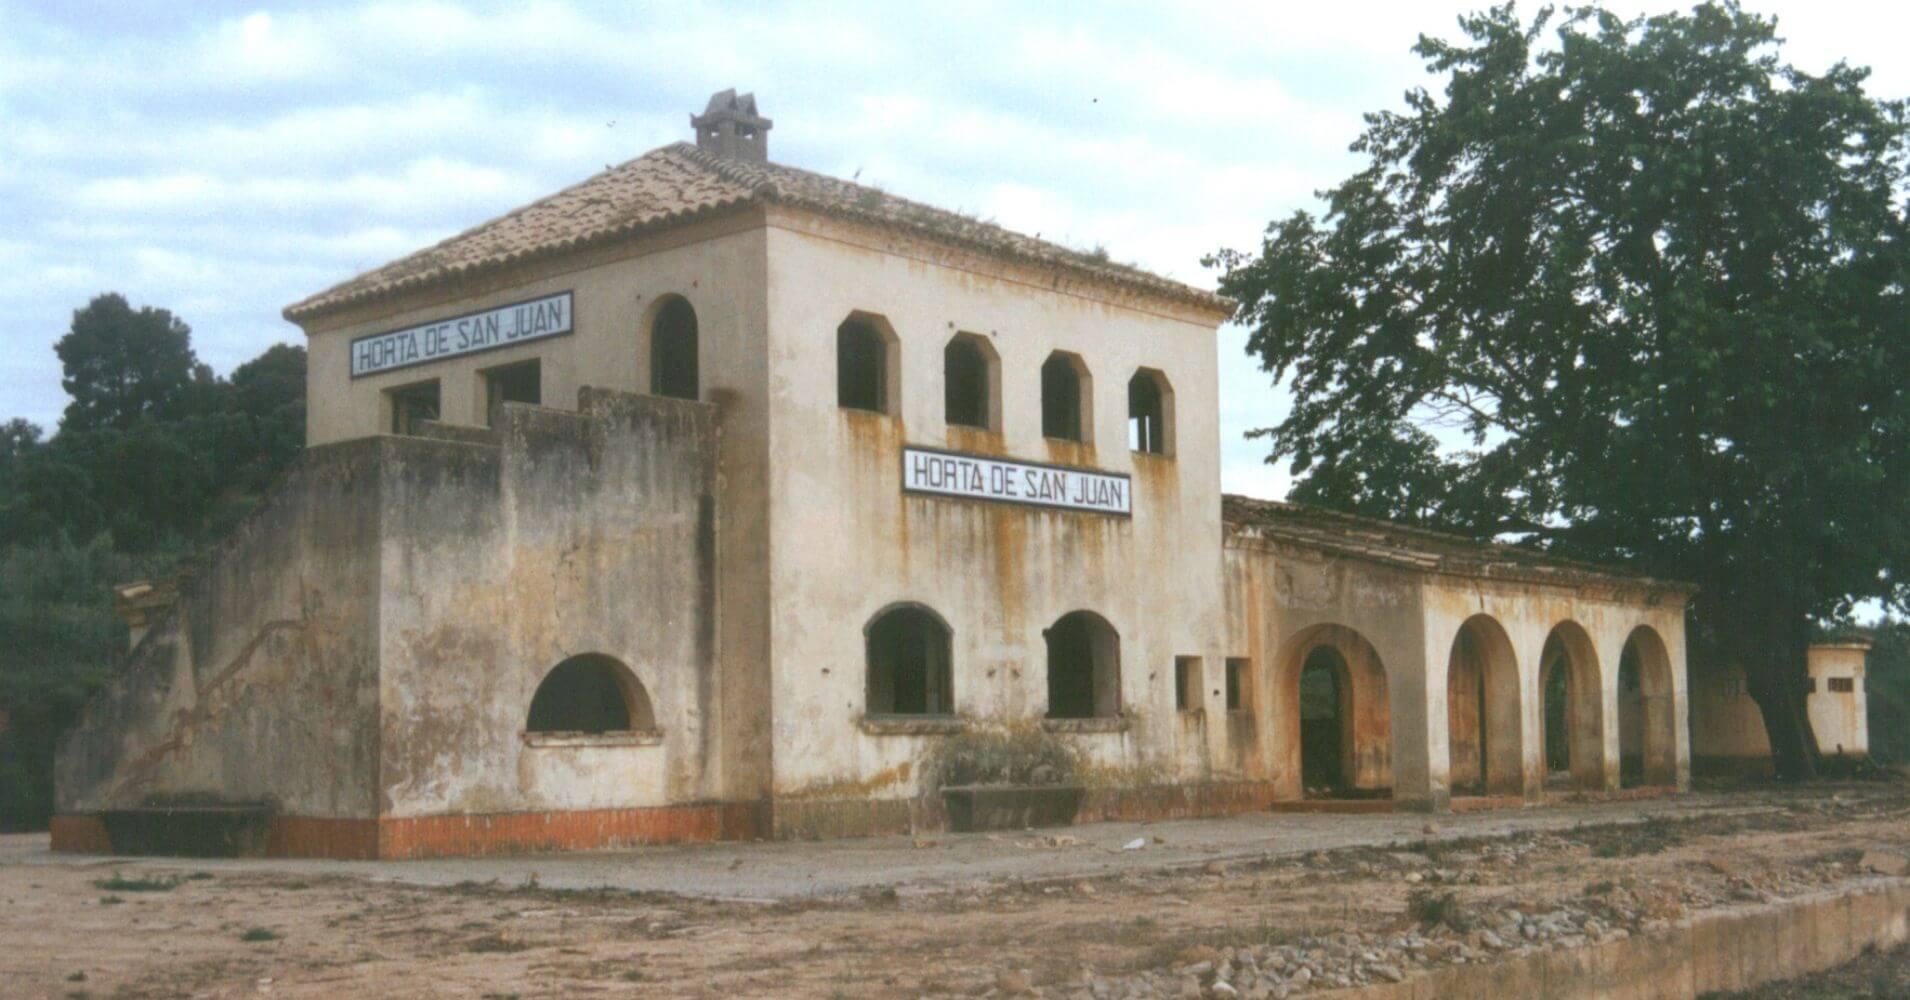 Vía Verde Terra Alta. Estación de Horta de San Juan. Tarragona, Catauña.